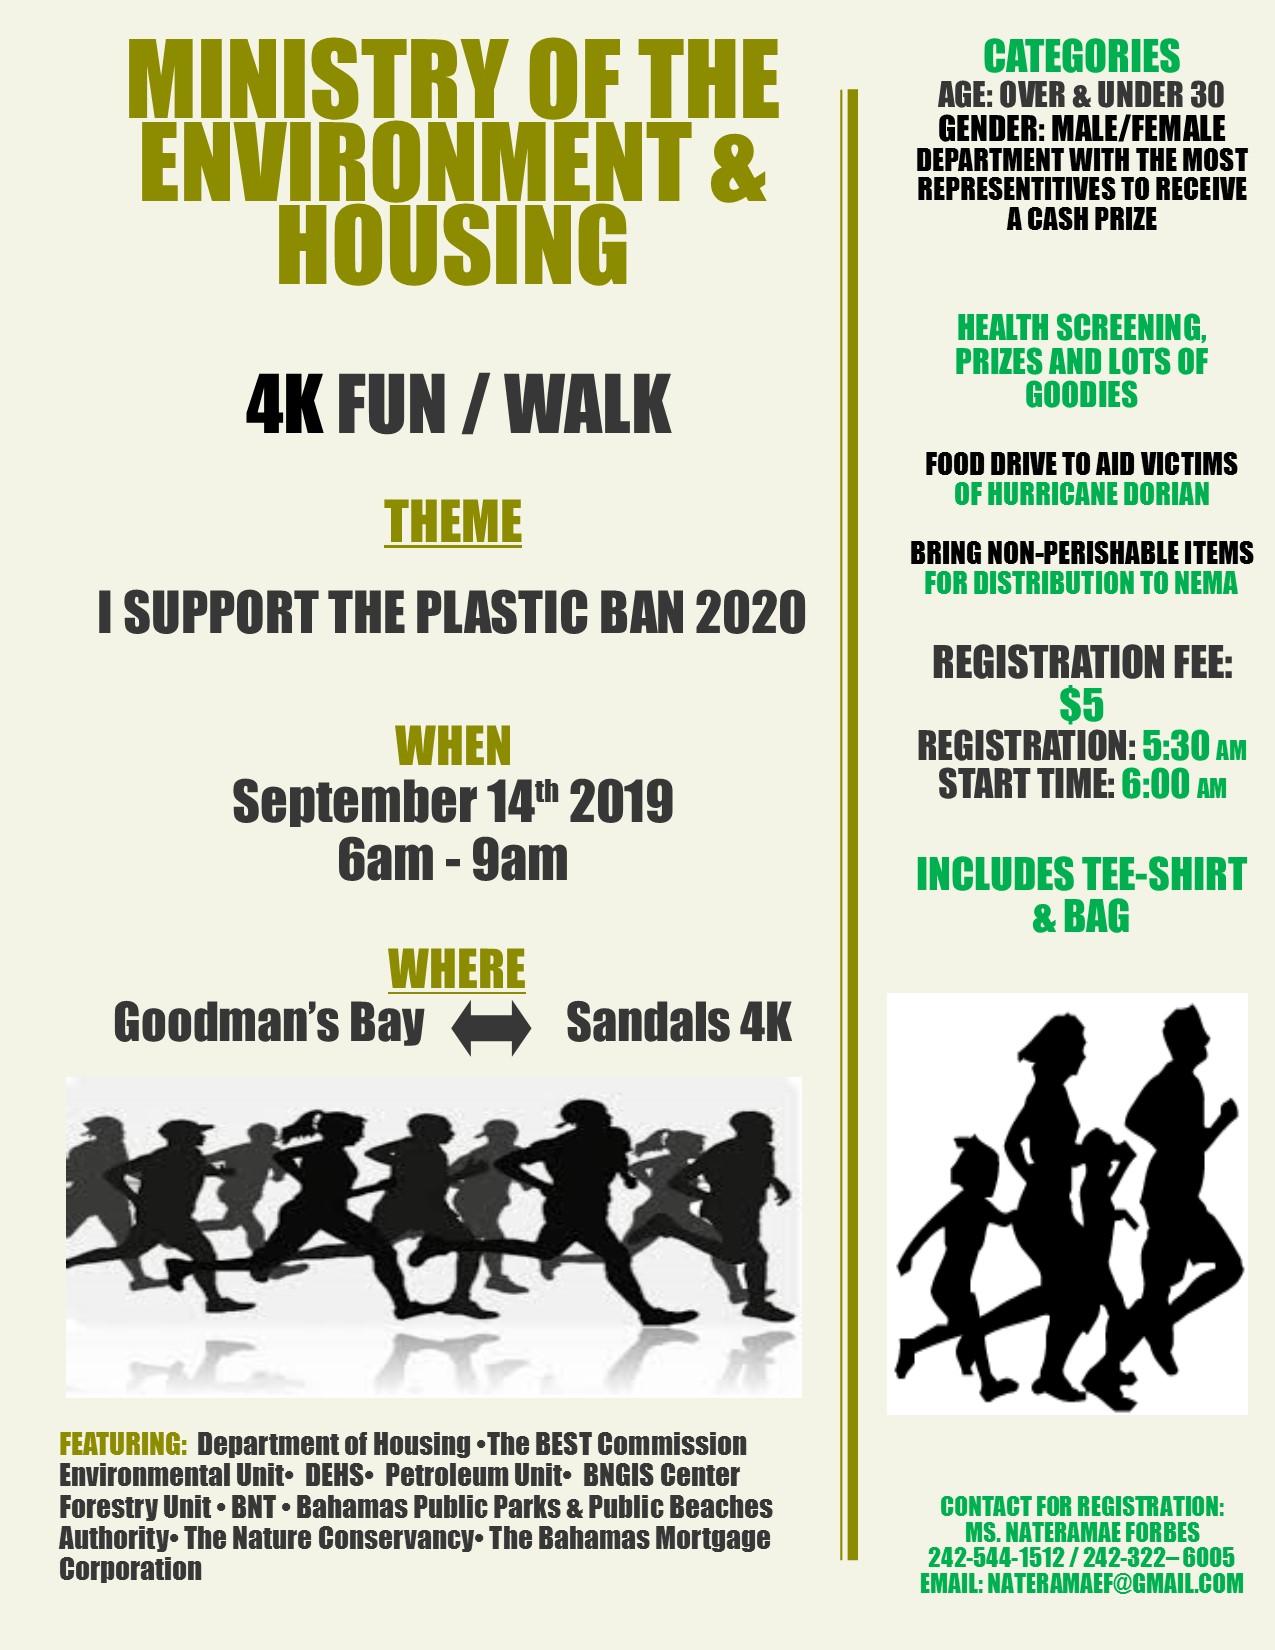 4K Fun/Walk - I Support the Plastic Ban 2020